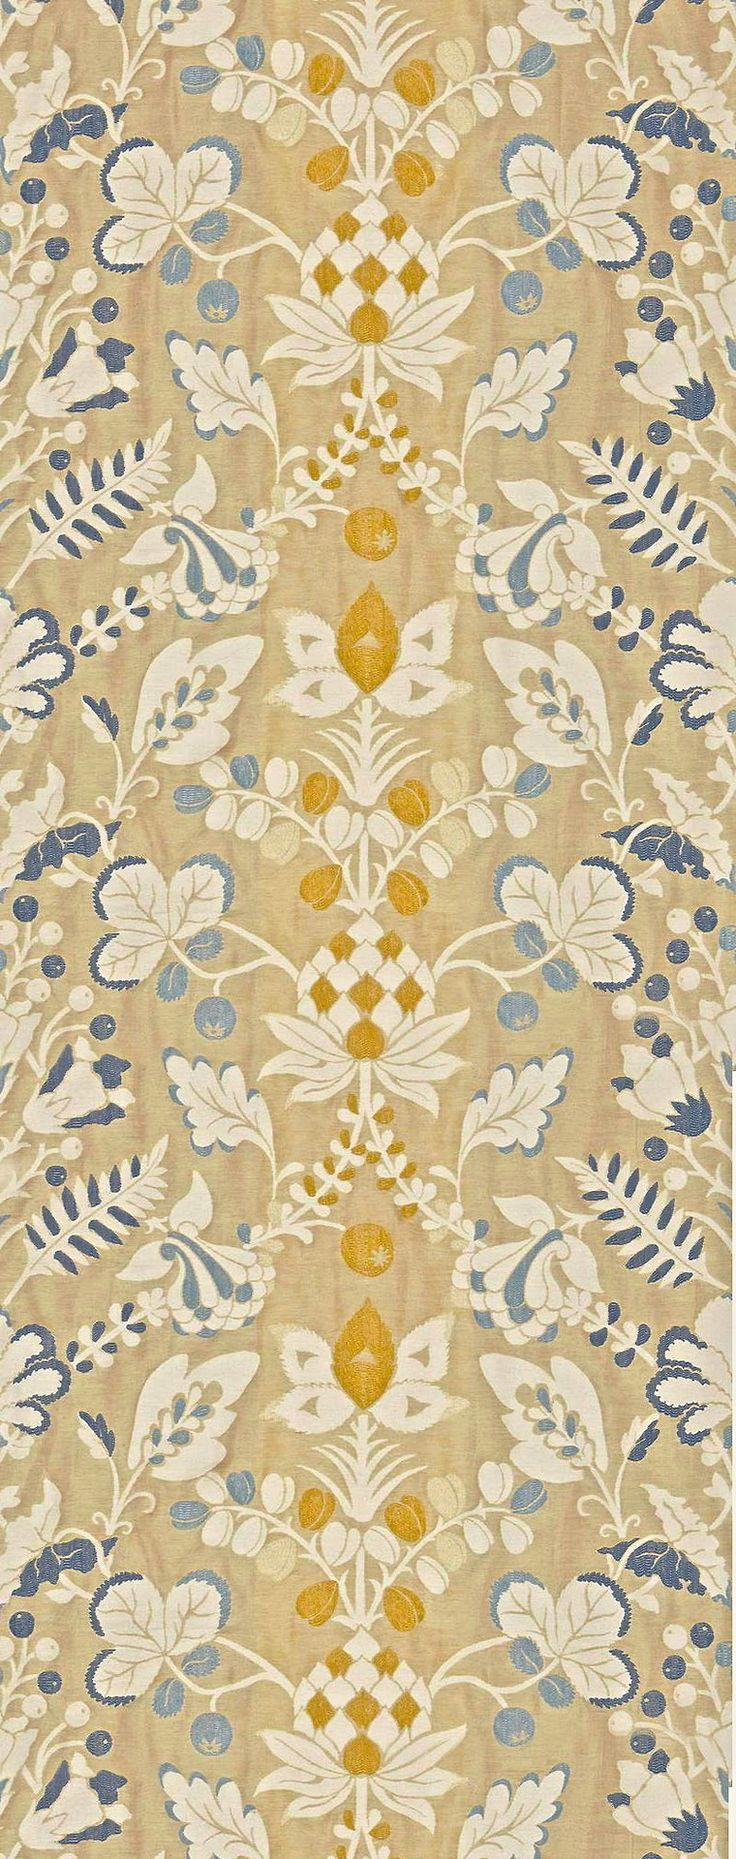 F Schumacher Fabric Ideas For The House Pinterest